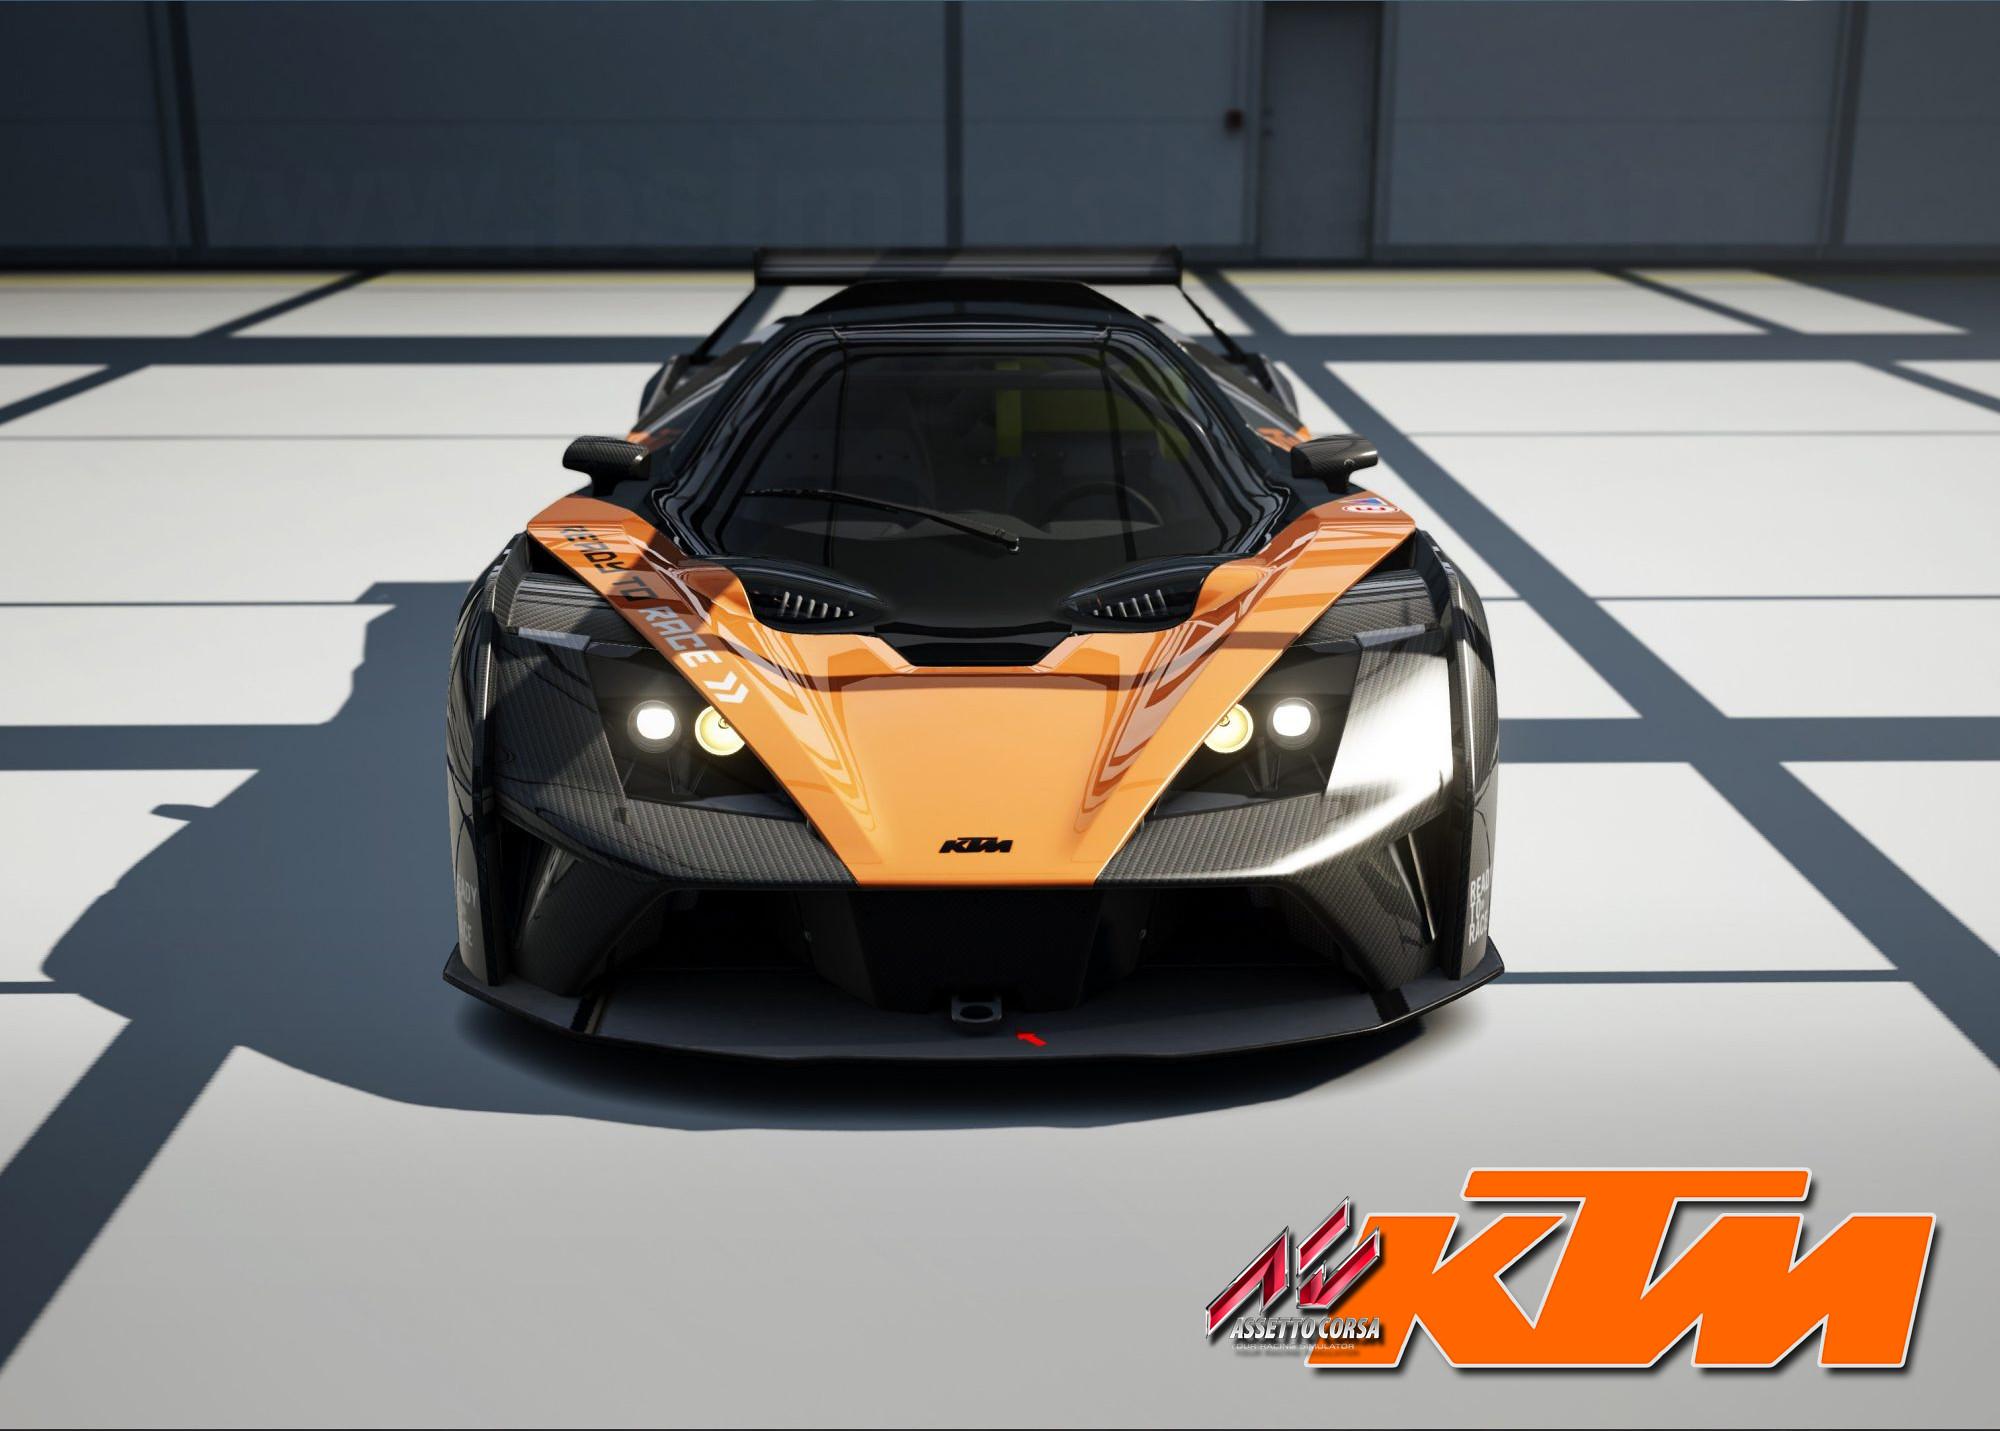 Assetto Corsa KTM Xbow GT4 3